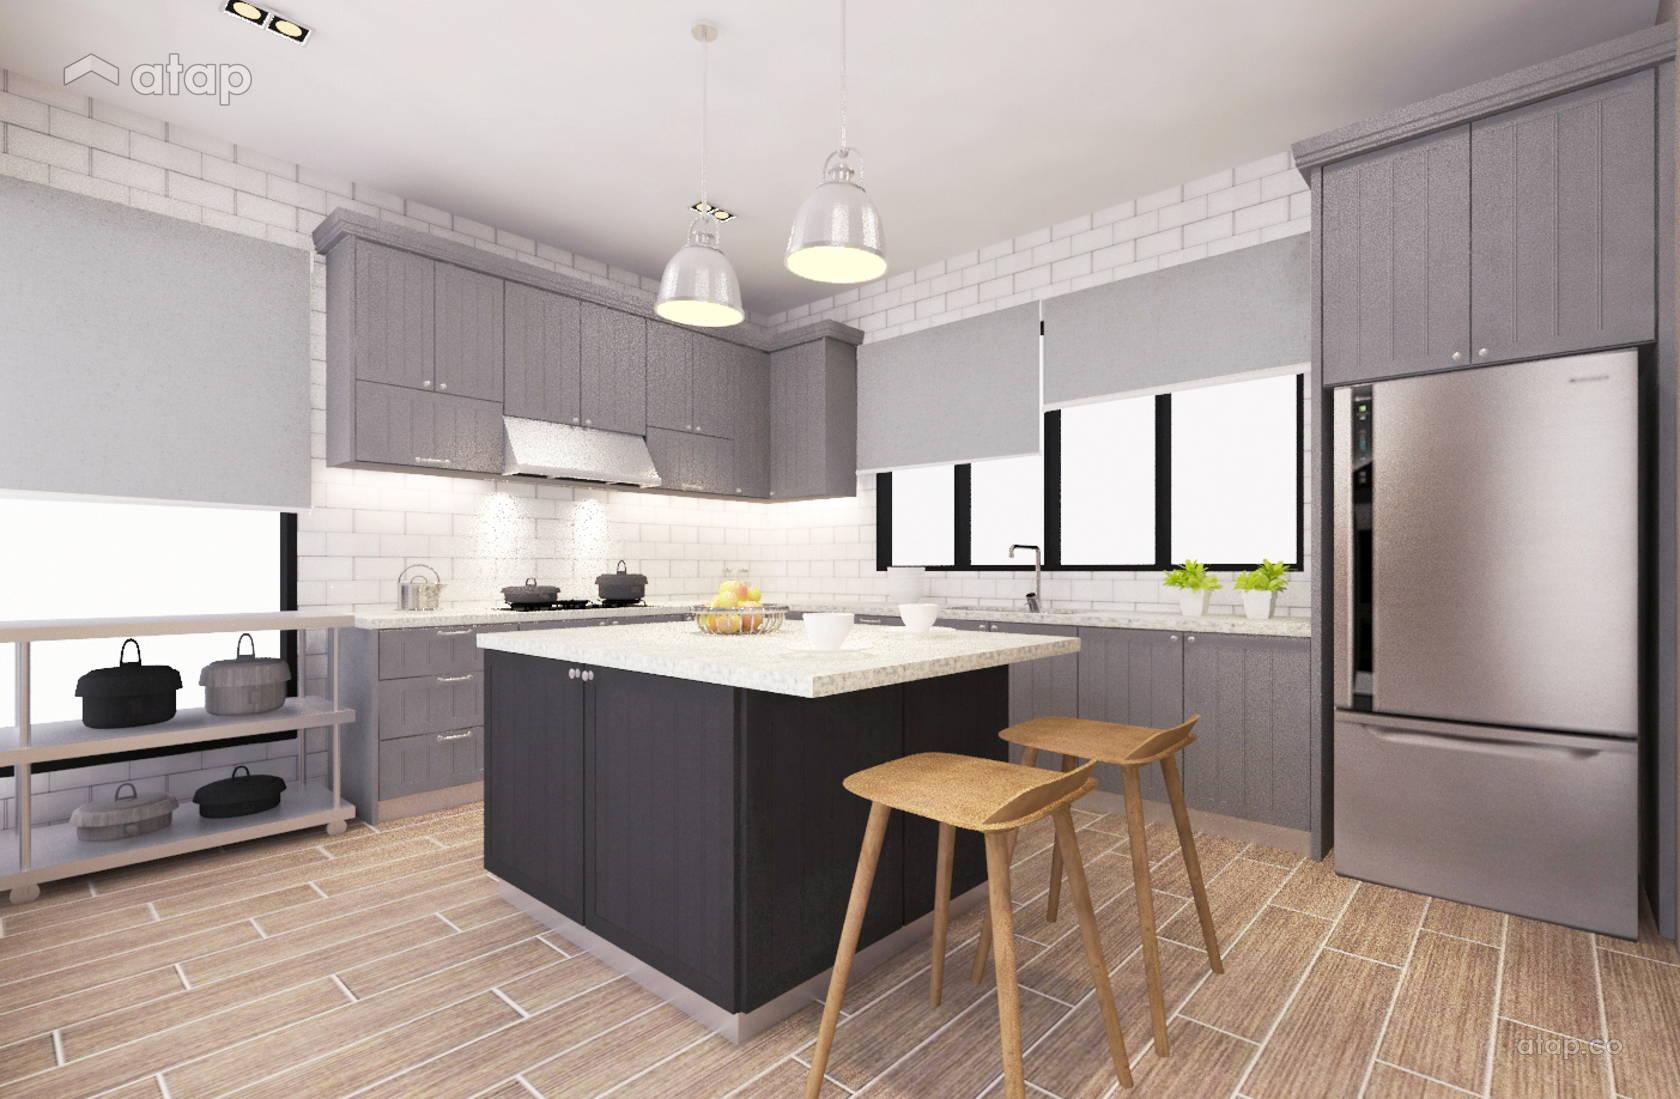 Semi D Sibu Interior Design Renovation Ideas Photos And